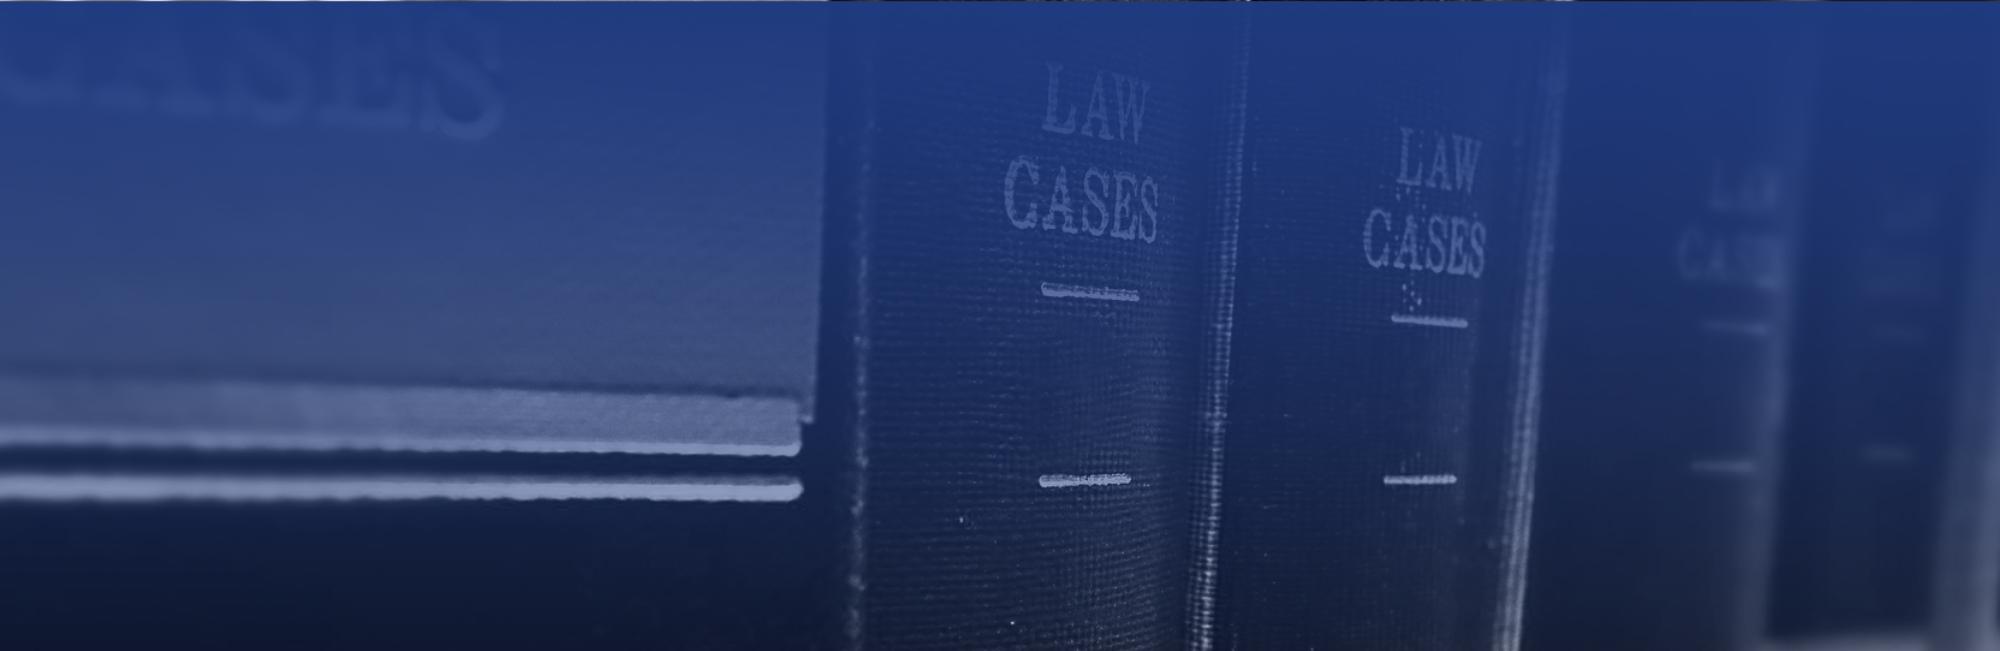 ACME Fiscal & Legal